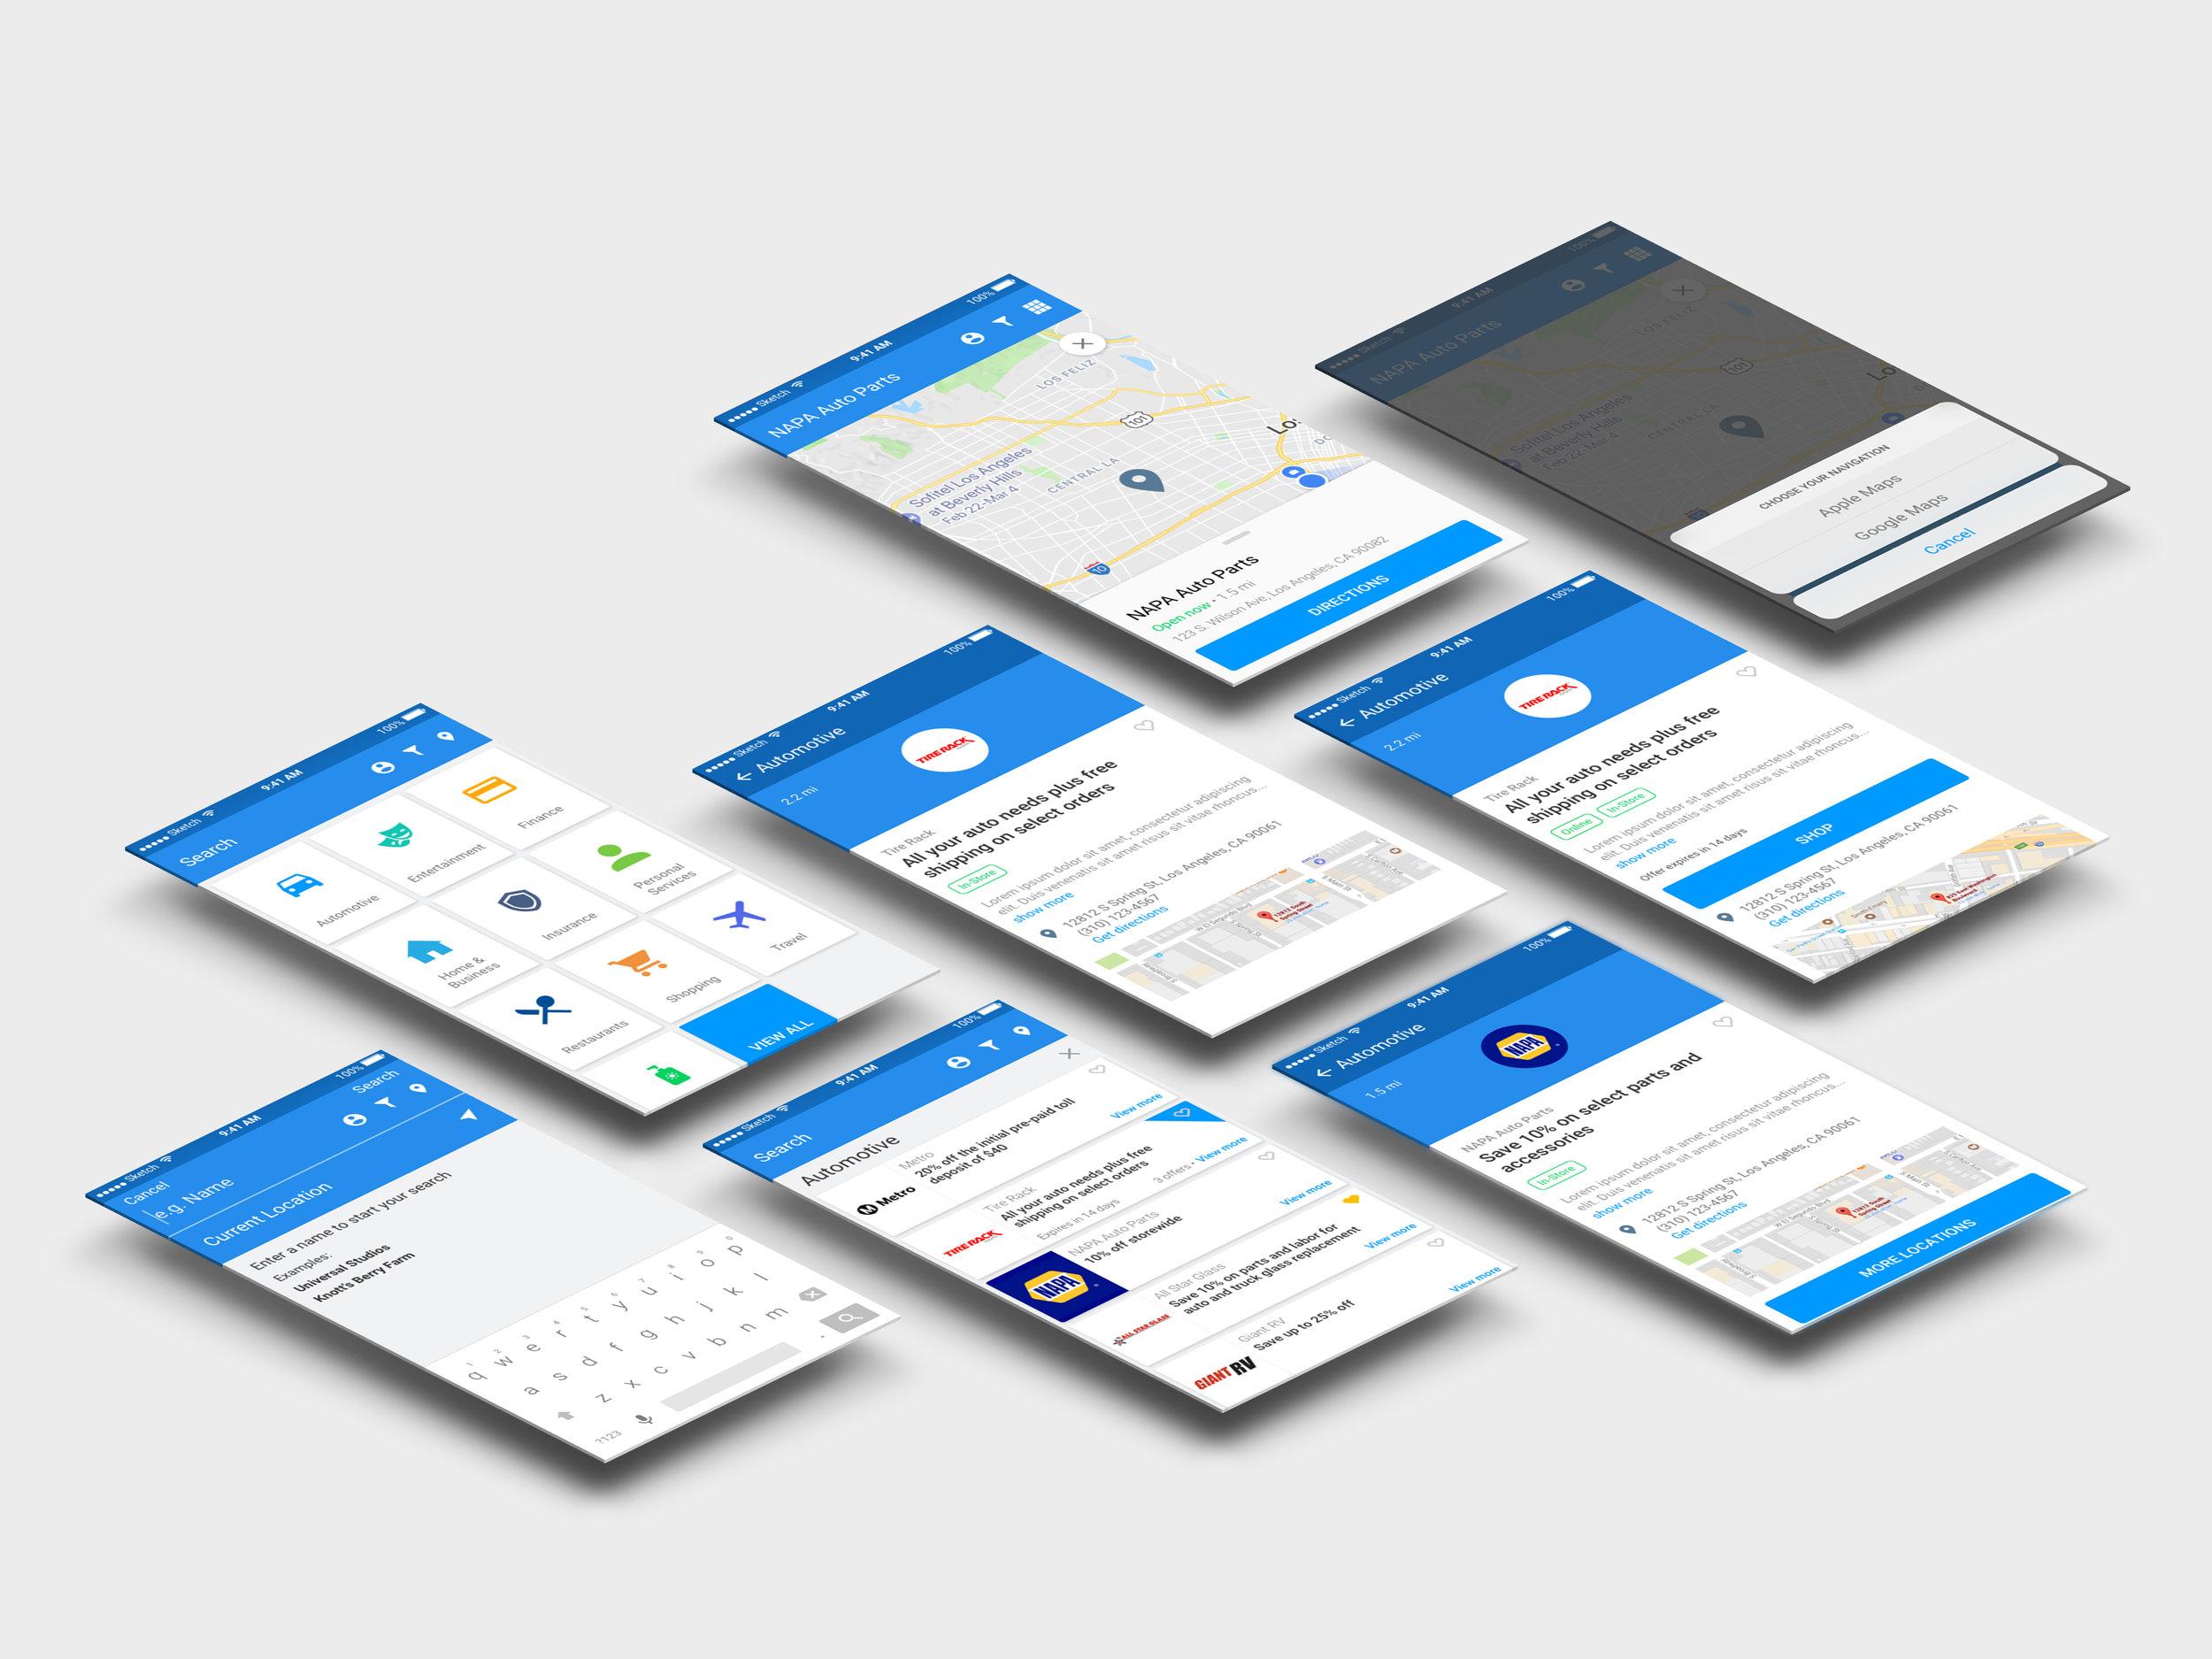 discounts-app-screens.jpg